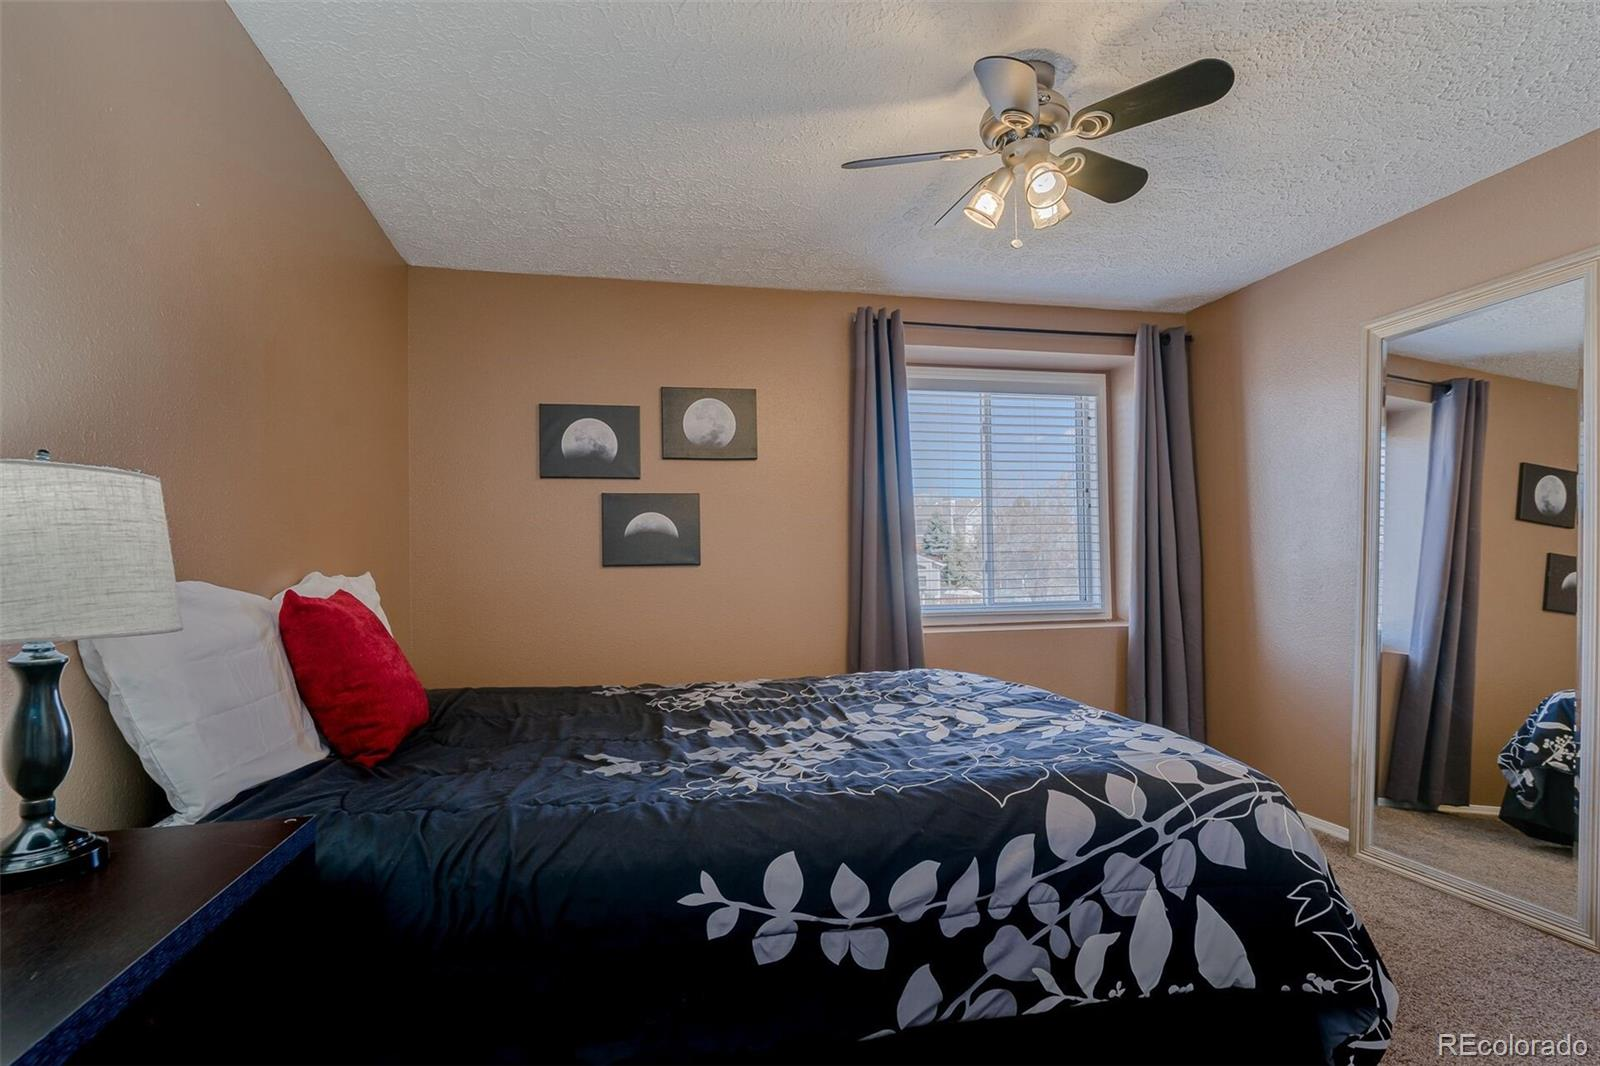 MLS# 8425770 - 35 - 6925 Battle Mountain Road, Colorado Springs, CO 80922